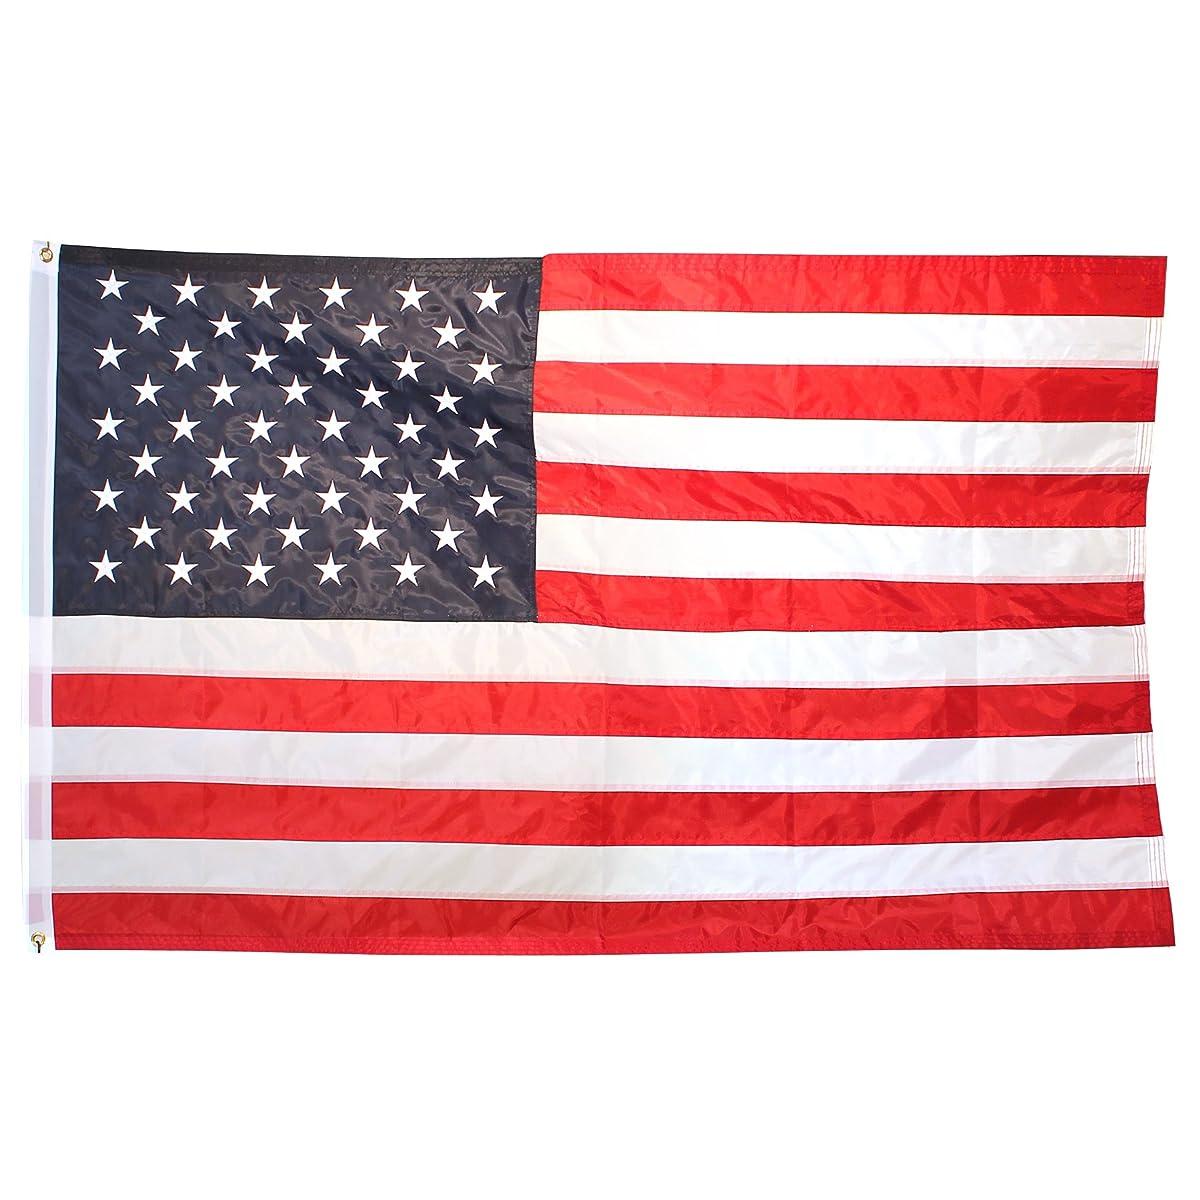 Flags Unlimited U.S. Nylon Flag - 3x5 Feet - Printed Stars and Stripes